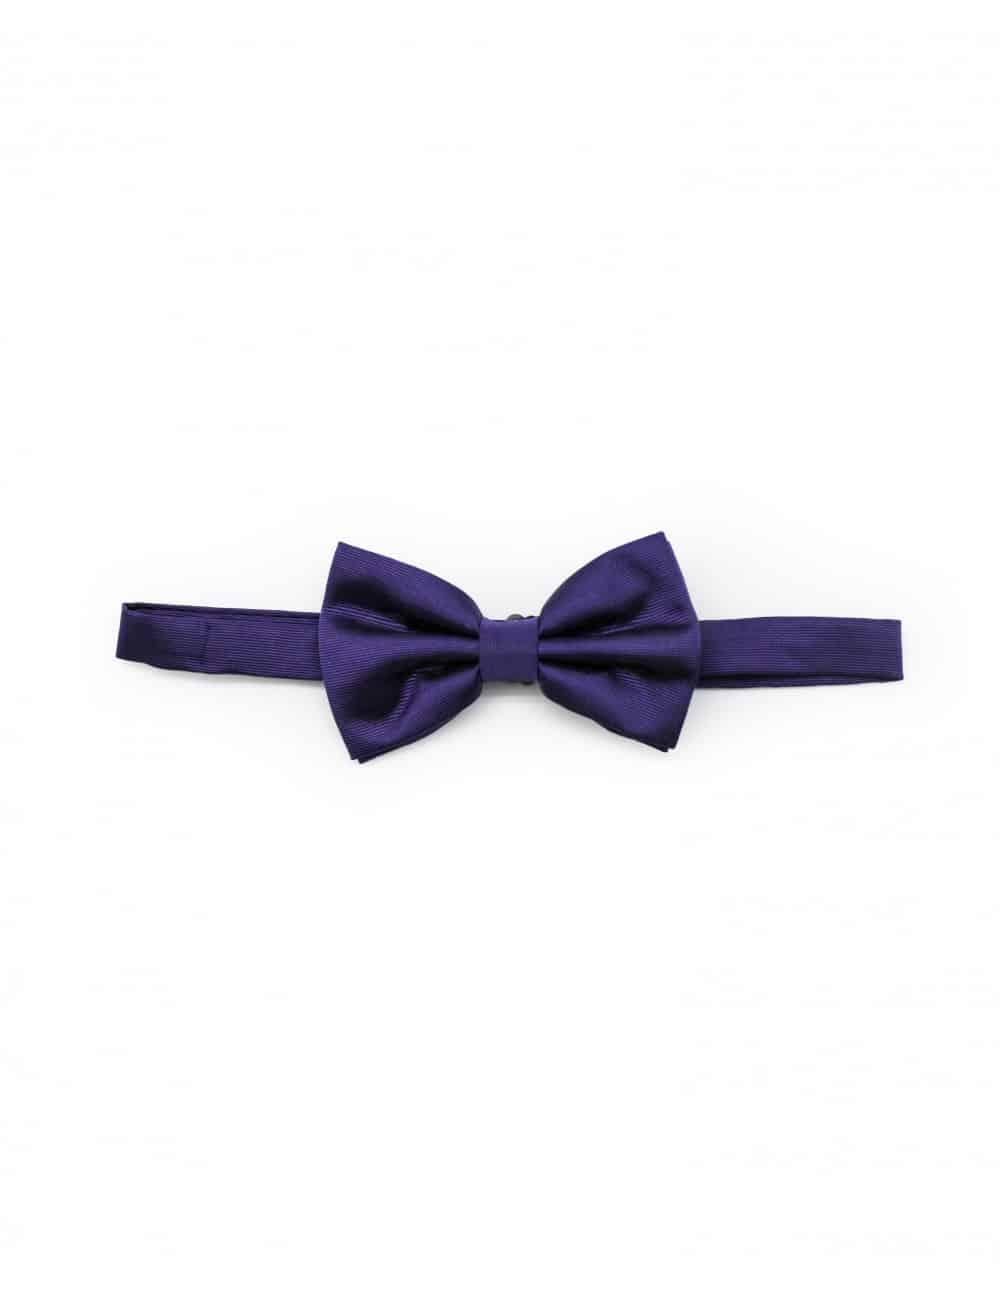 Solid Royal Purple Woven Bowtie WBT13.5